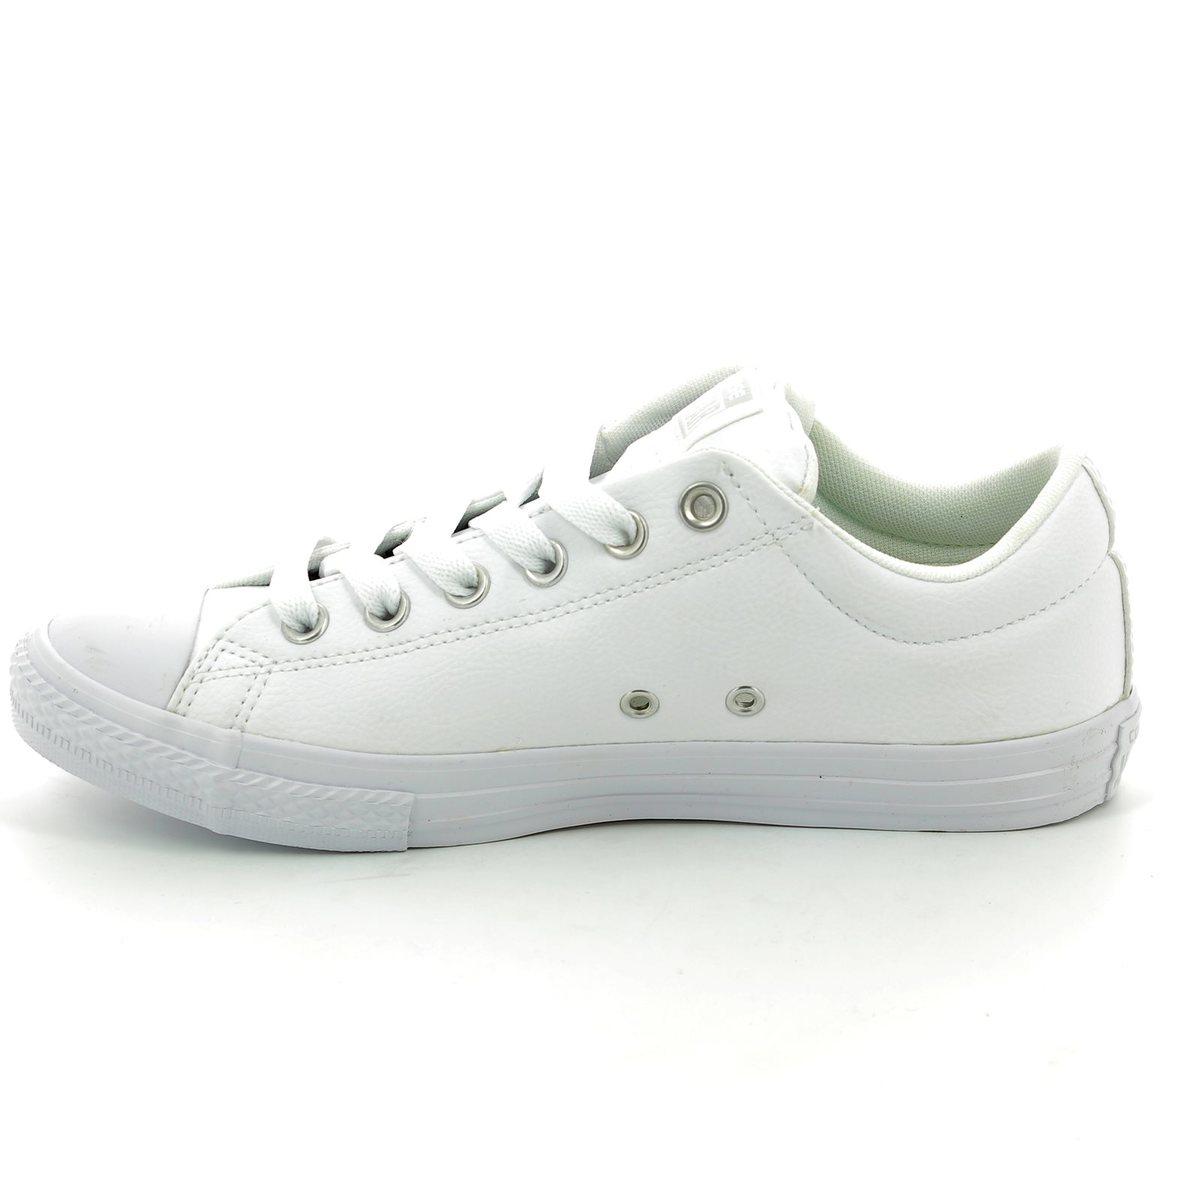 d43df3d4e6dfdb Converse Trainers - White - 651782C Chuck Taylor All Star Street Slip